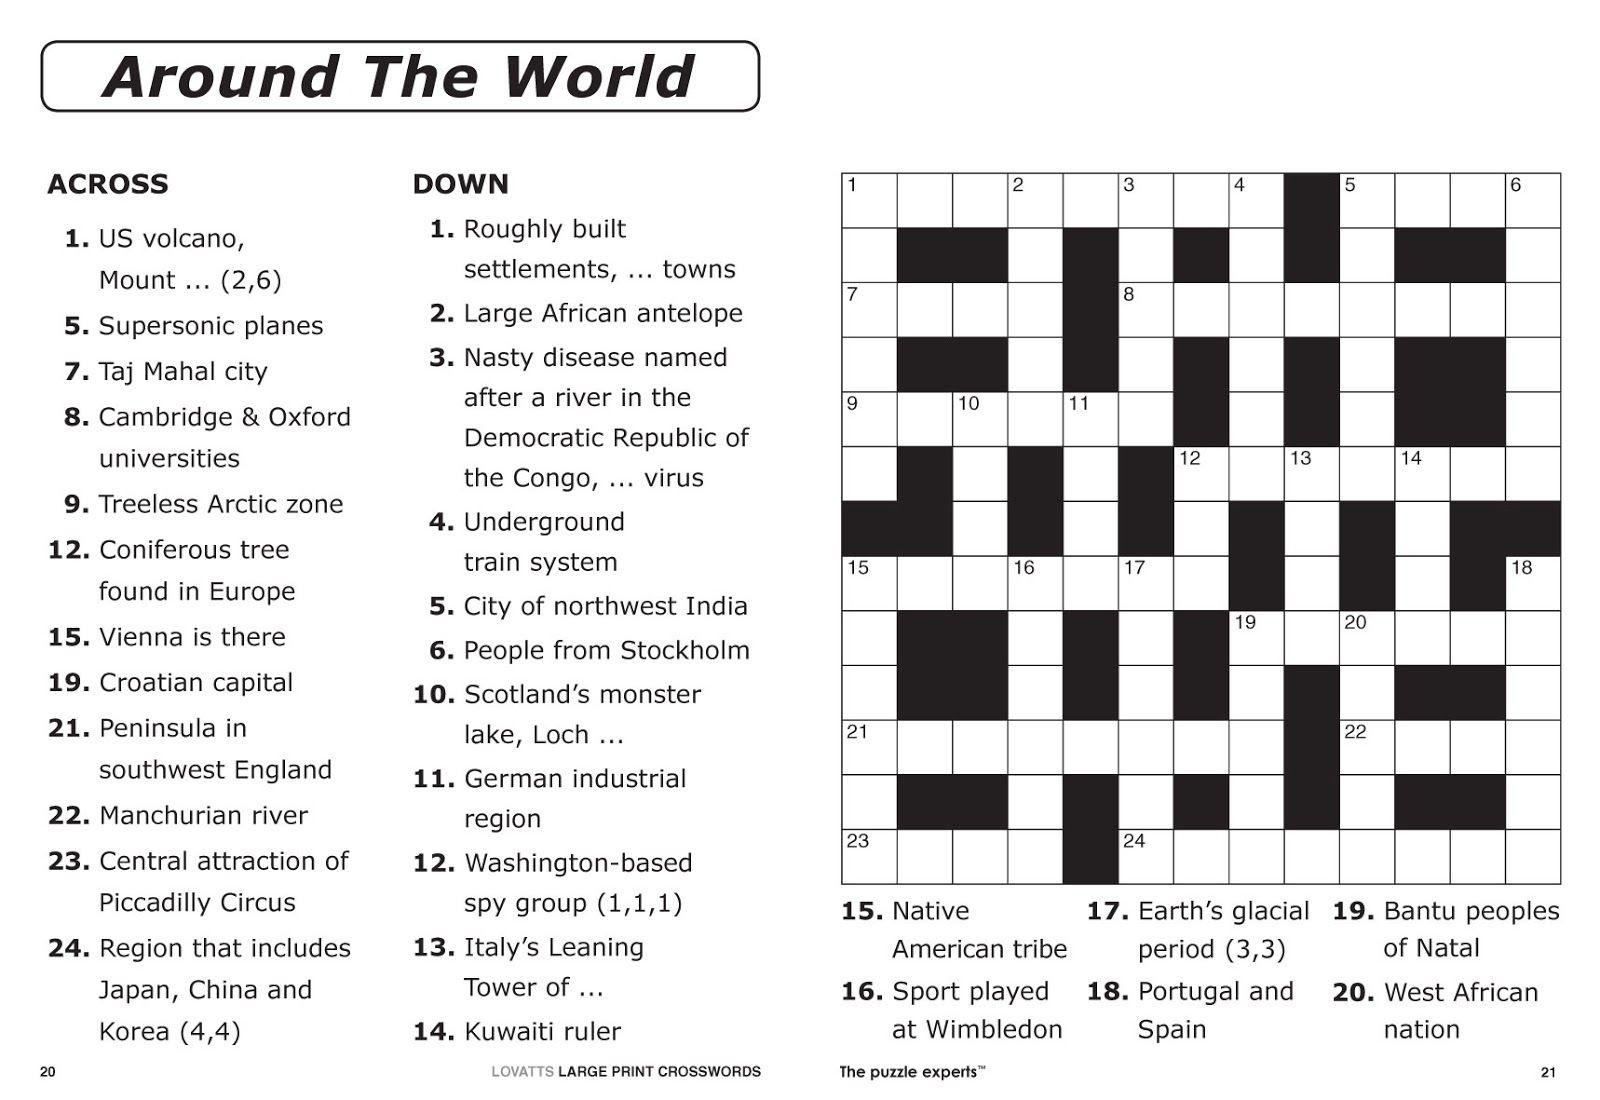 Free Printable Large Print Crossword Puzzles | M3U8 - Printable Sports Trivia Crossword Puzzles